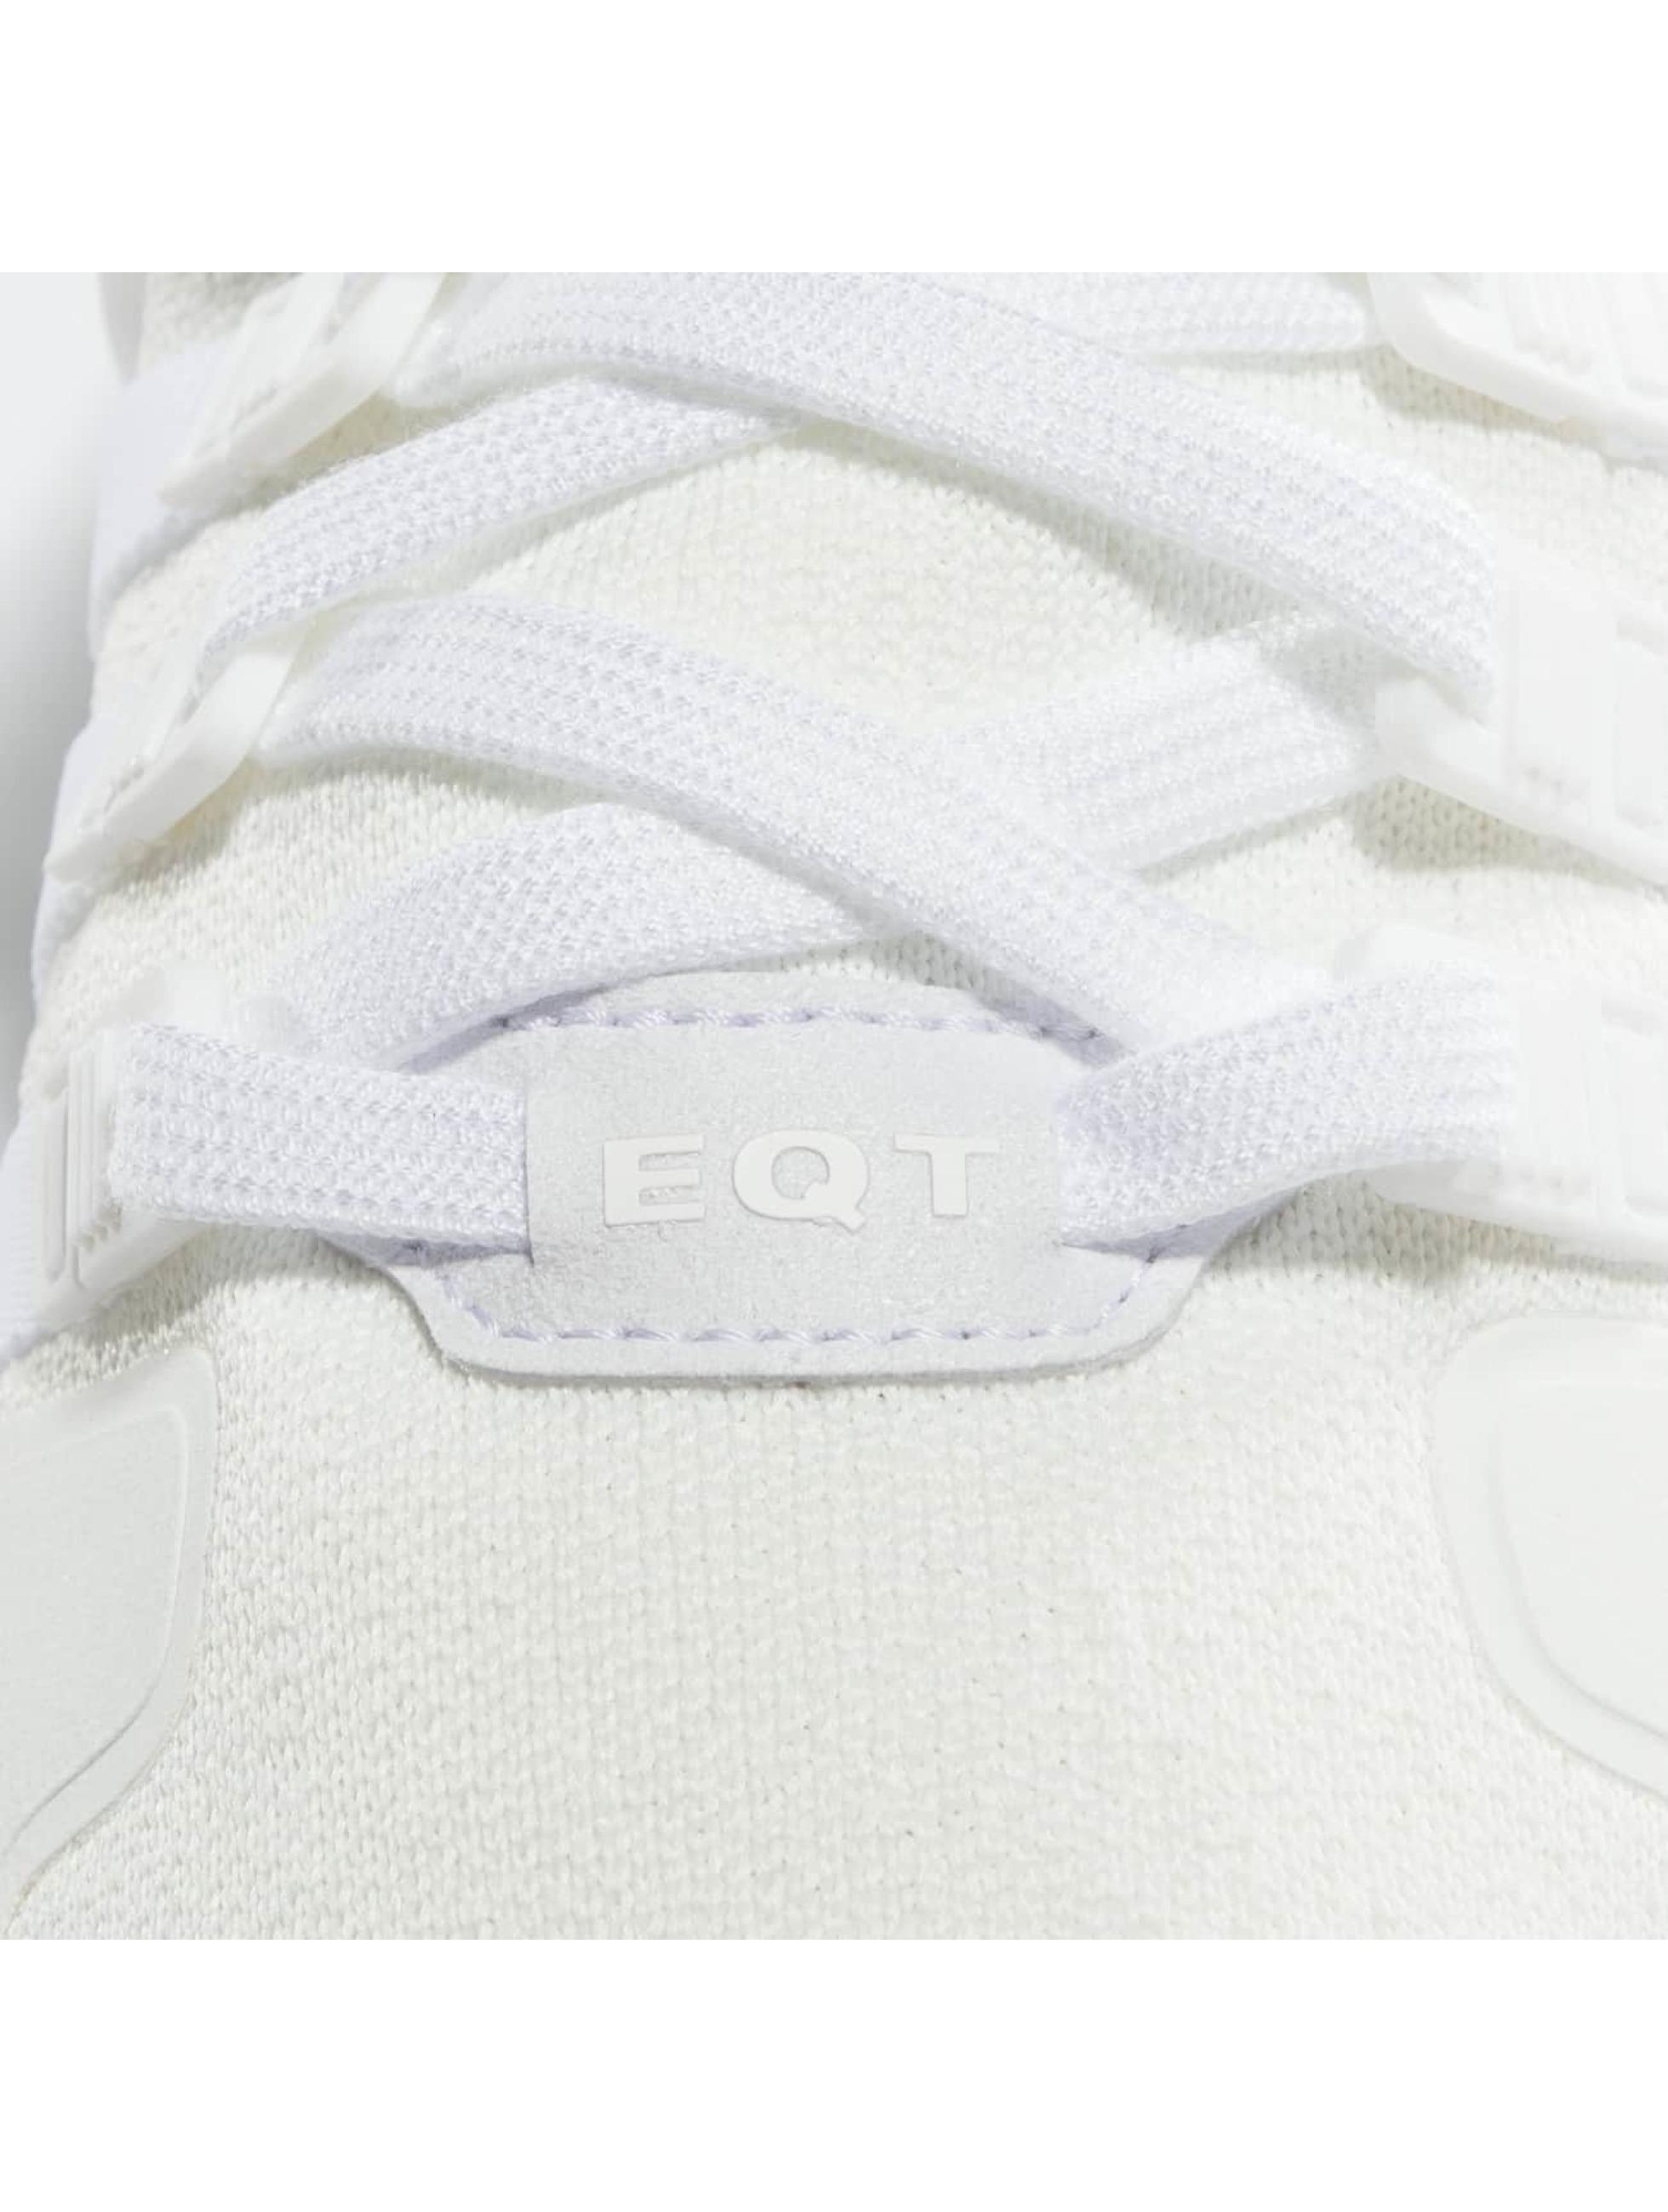 adidas originals Sneakers Equipment Support ADV white